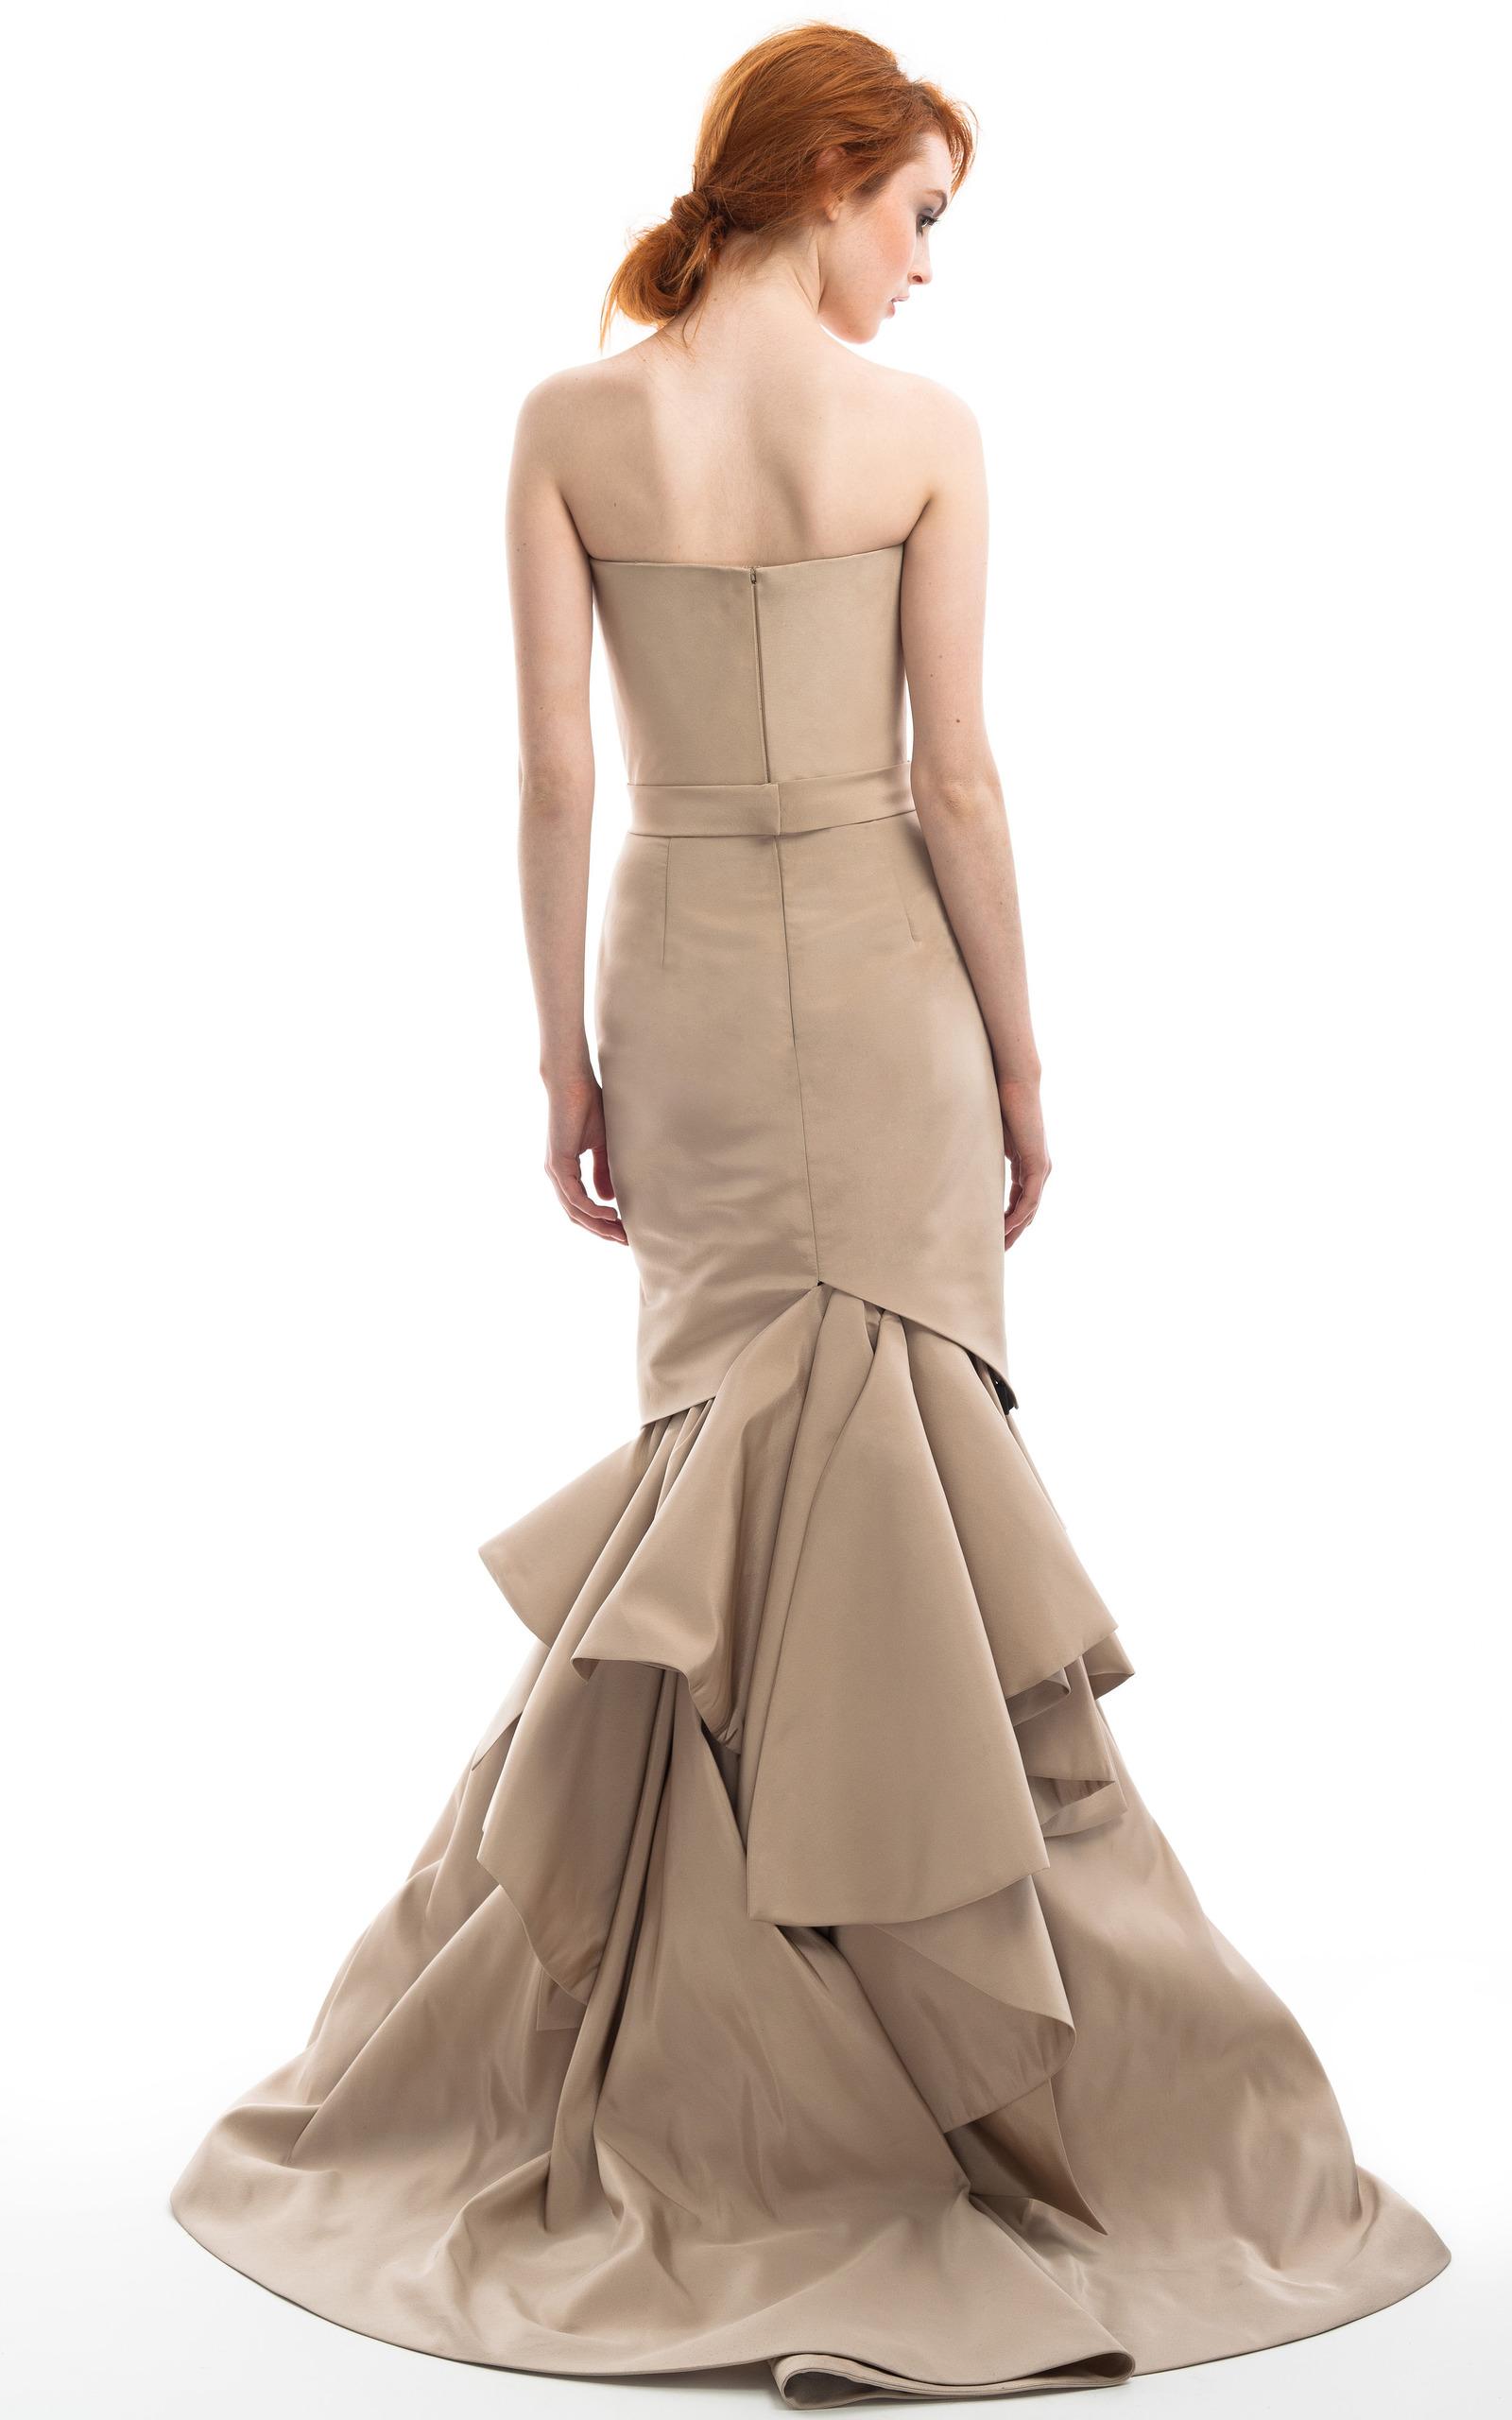 Origami Drape Gown by J. Mendel | Moda Operandi